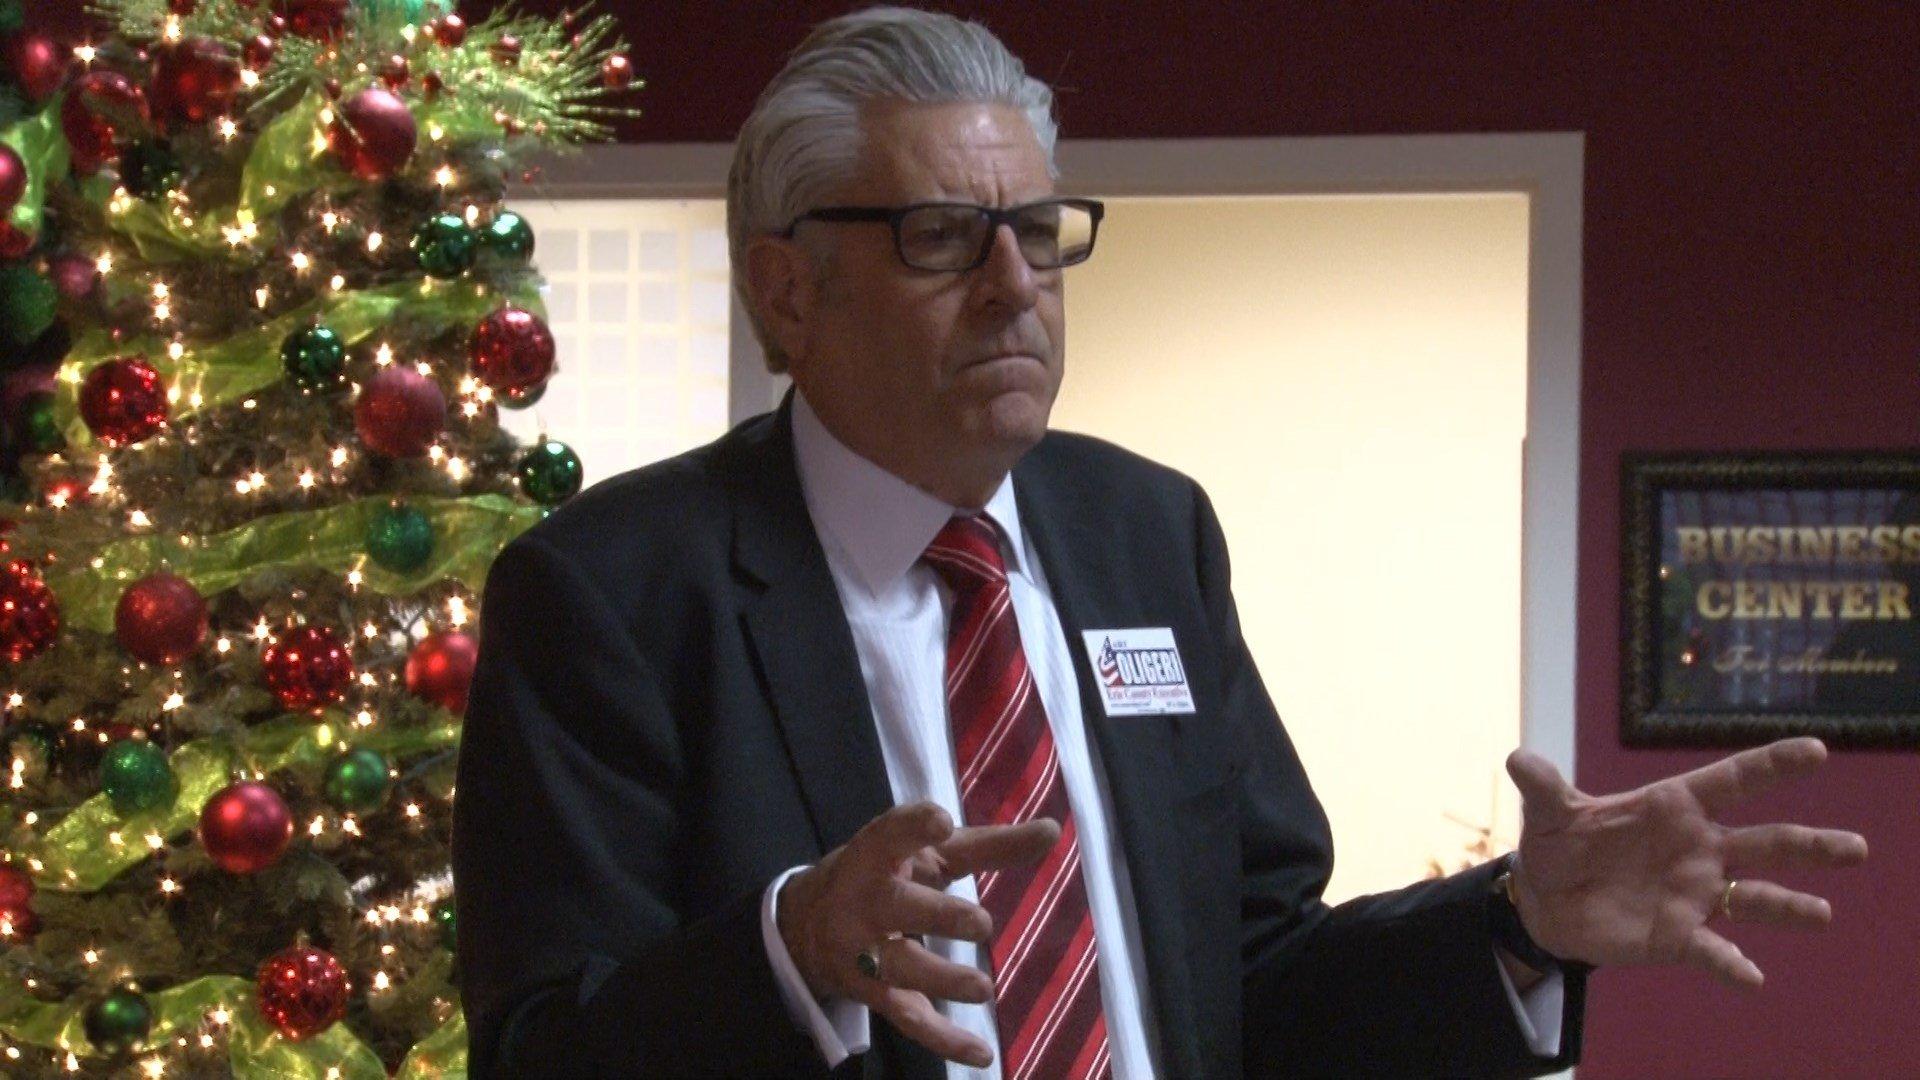 Republican Erie County Executive Candidate, Art Oligeri